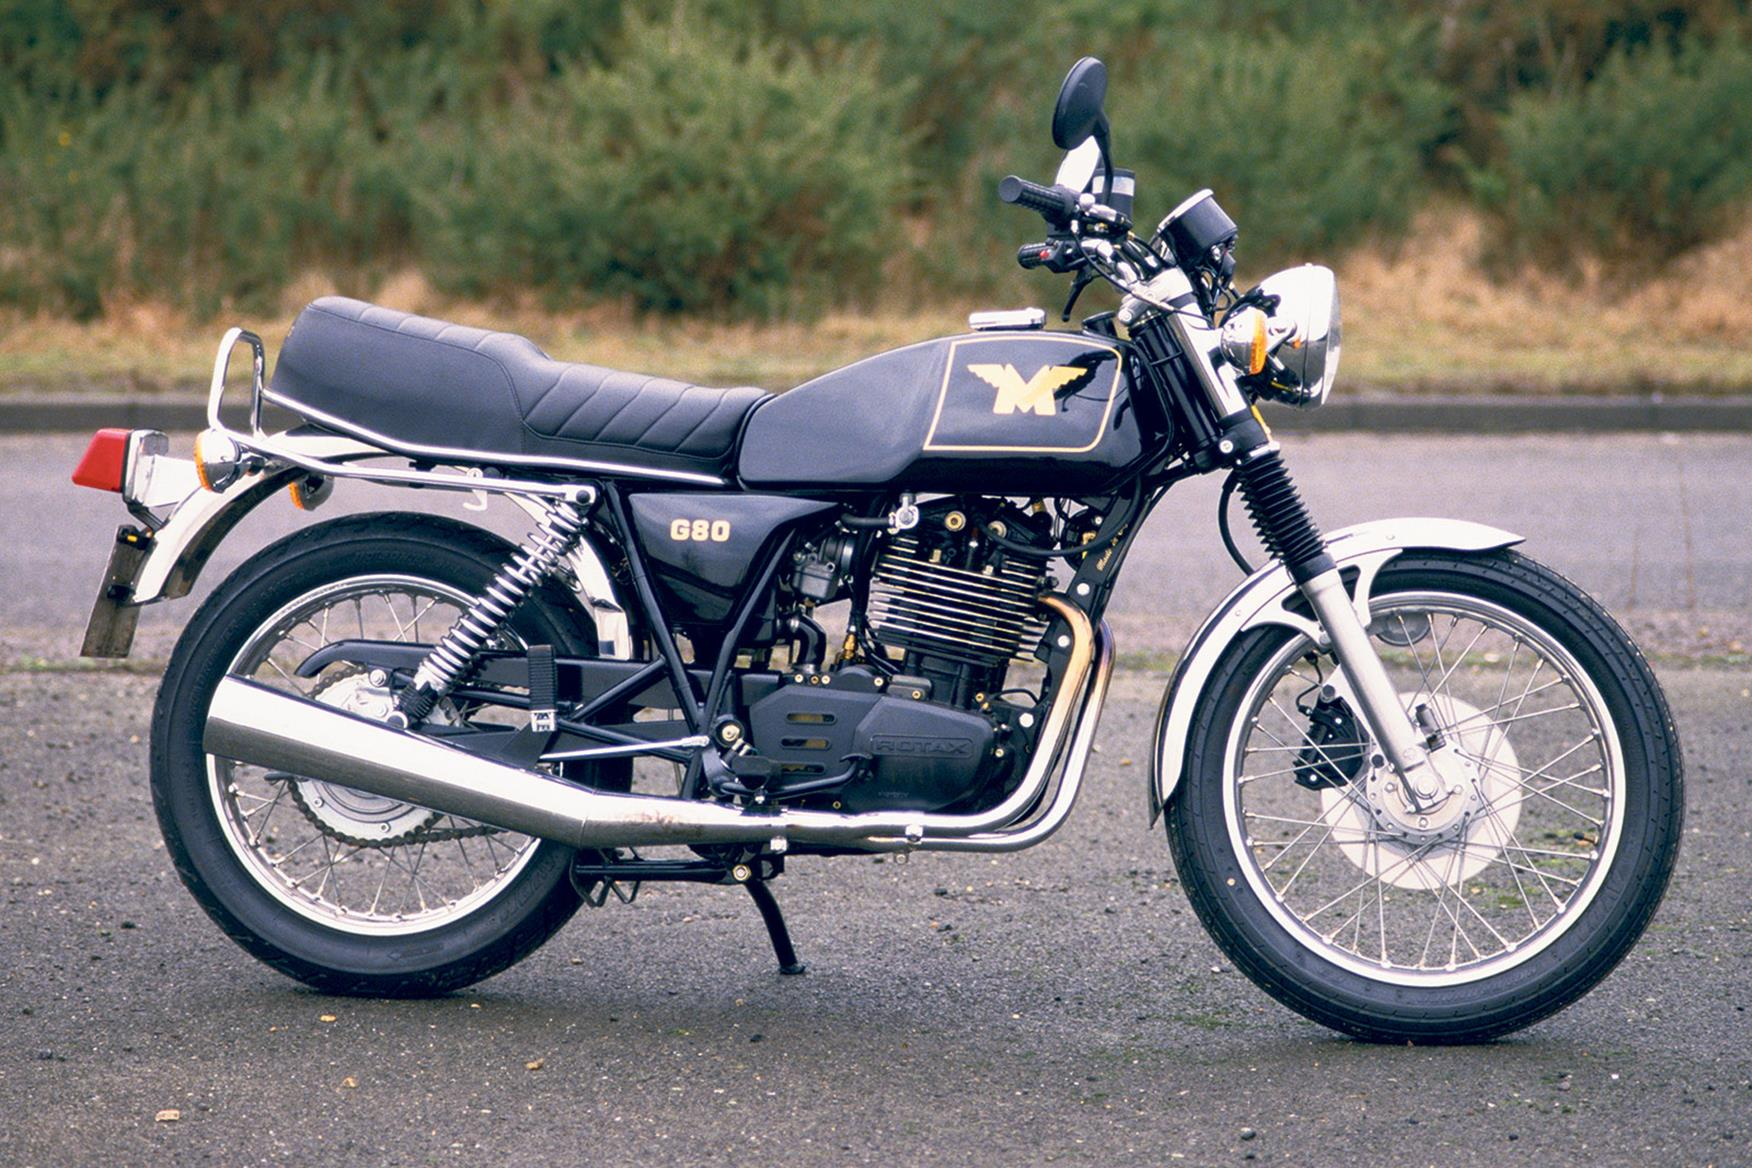 Biggest single cylinder motorcycle